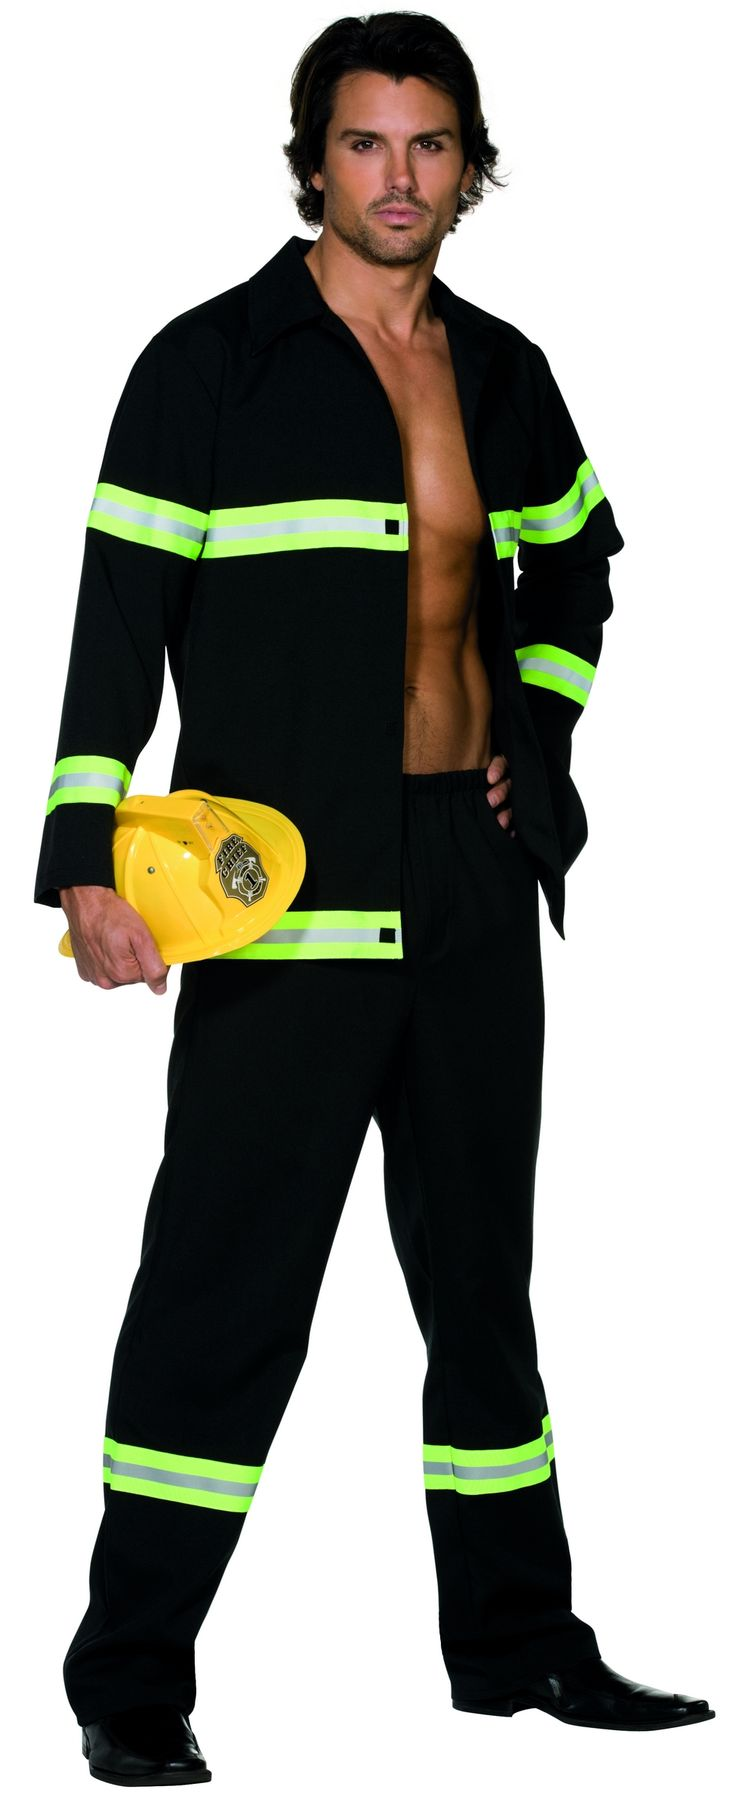 Fireman costume £41.98